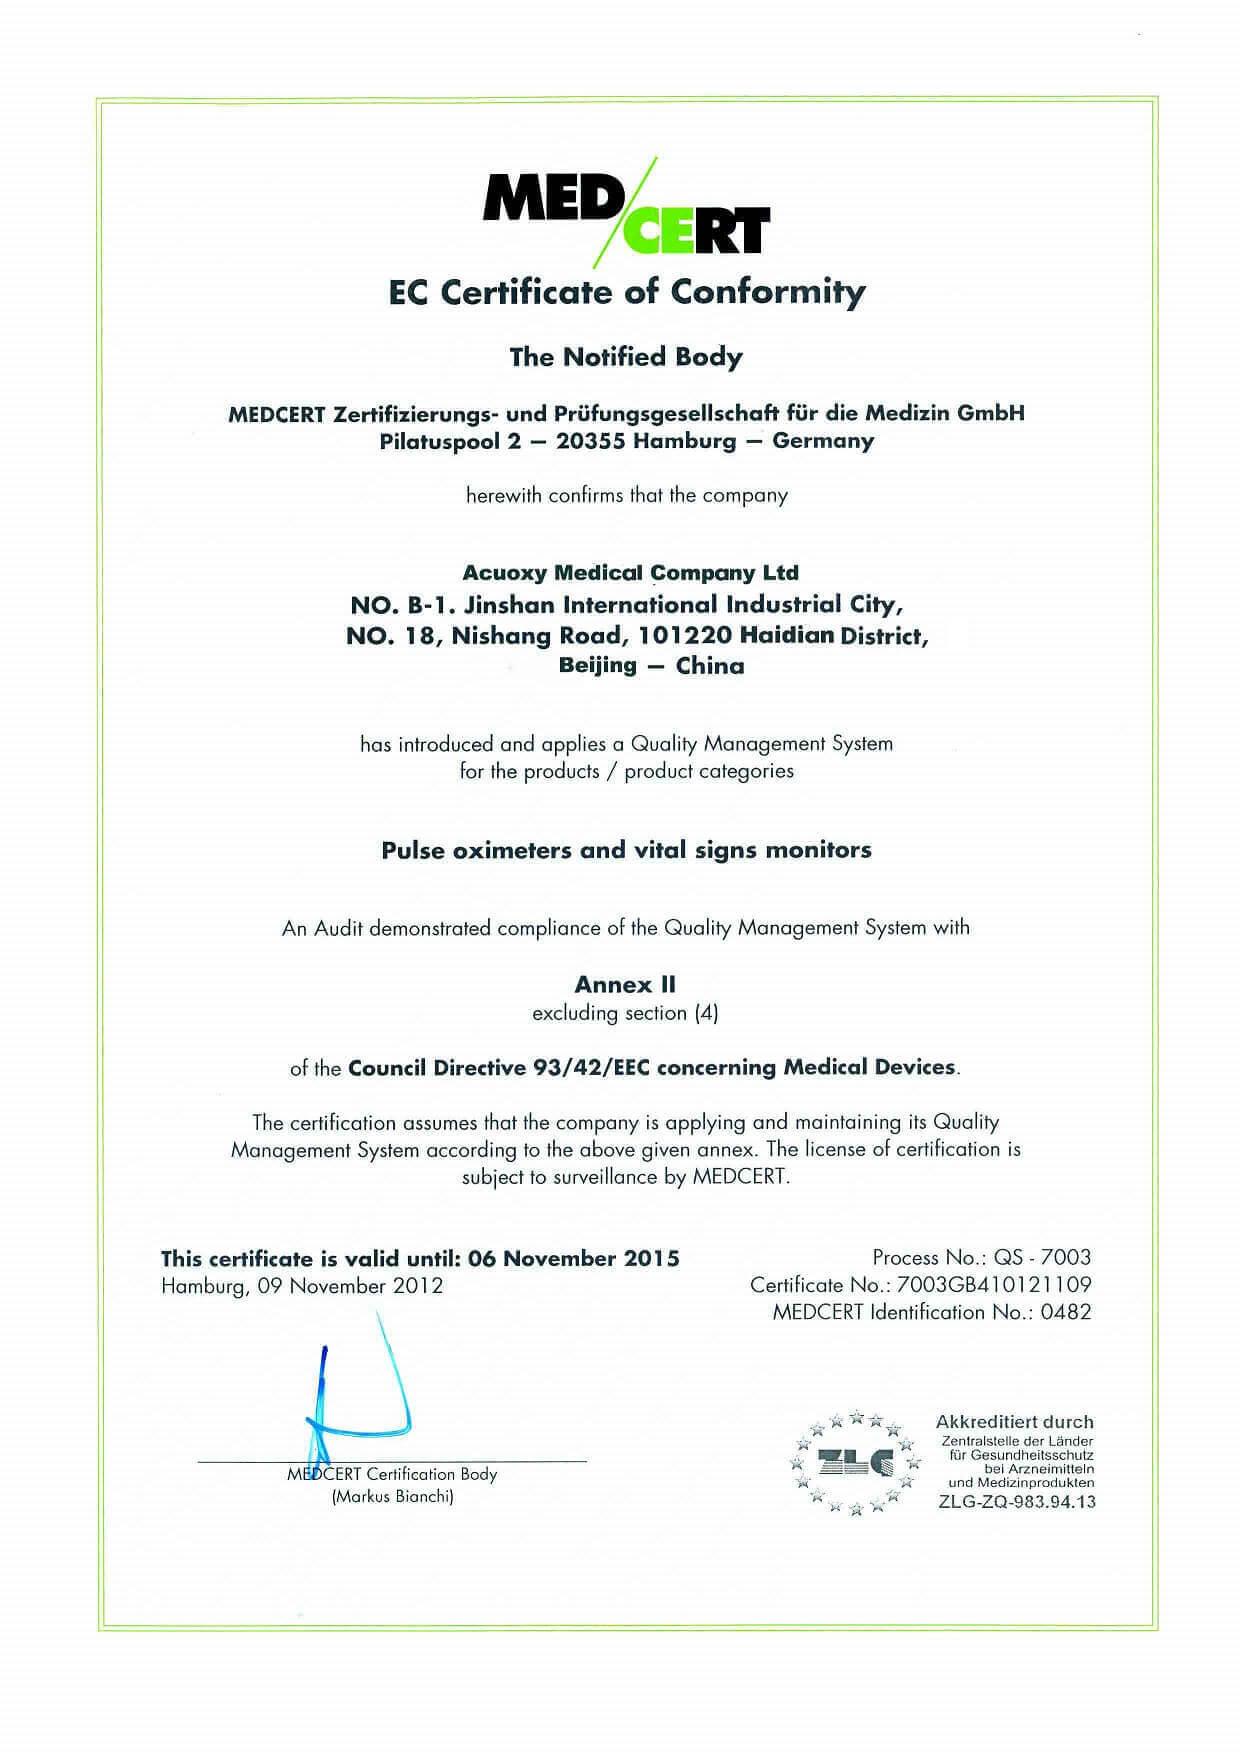 medcert_fake-certificate